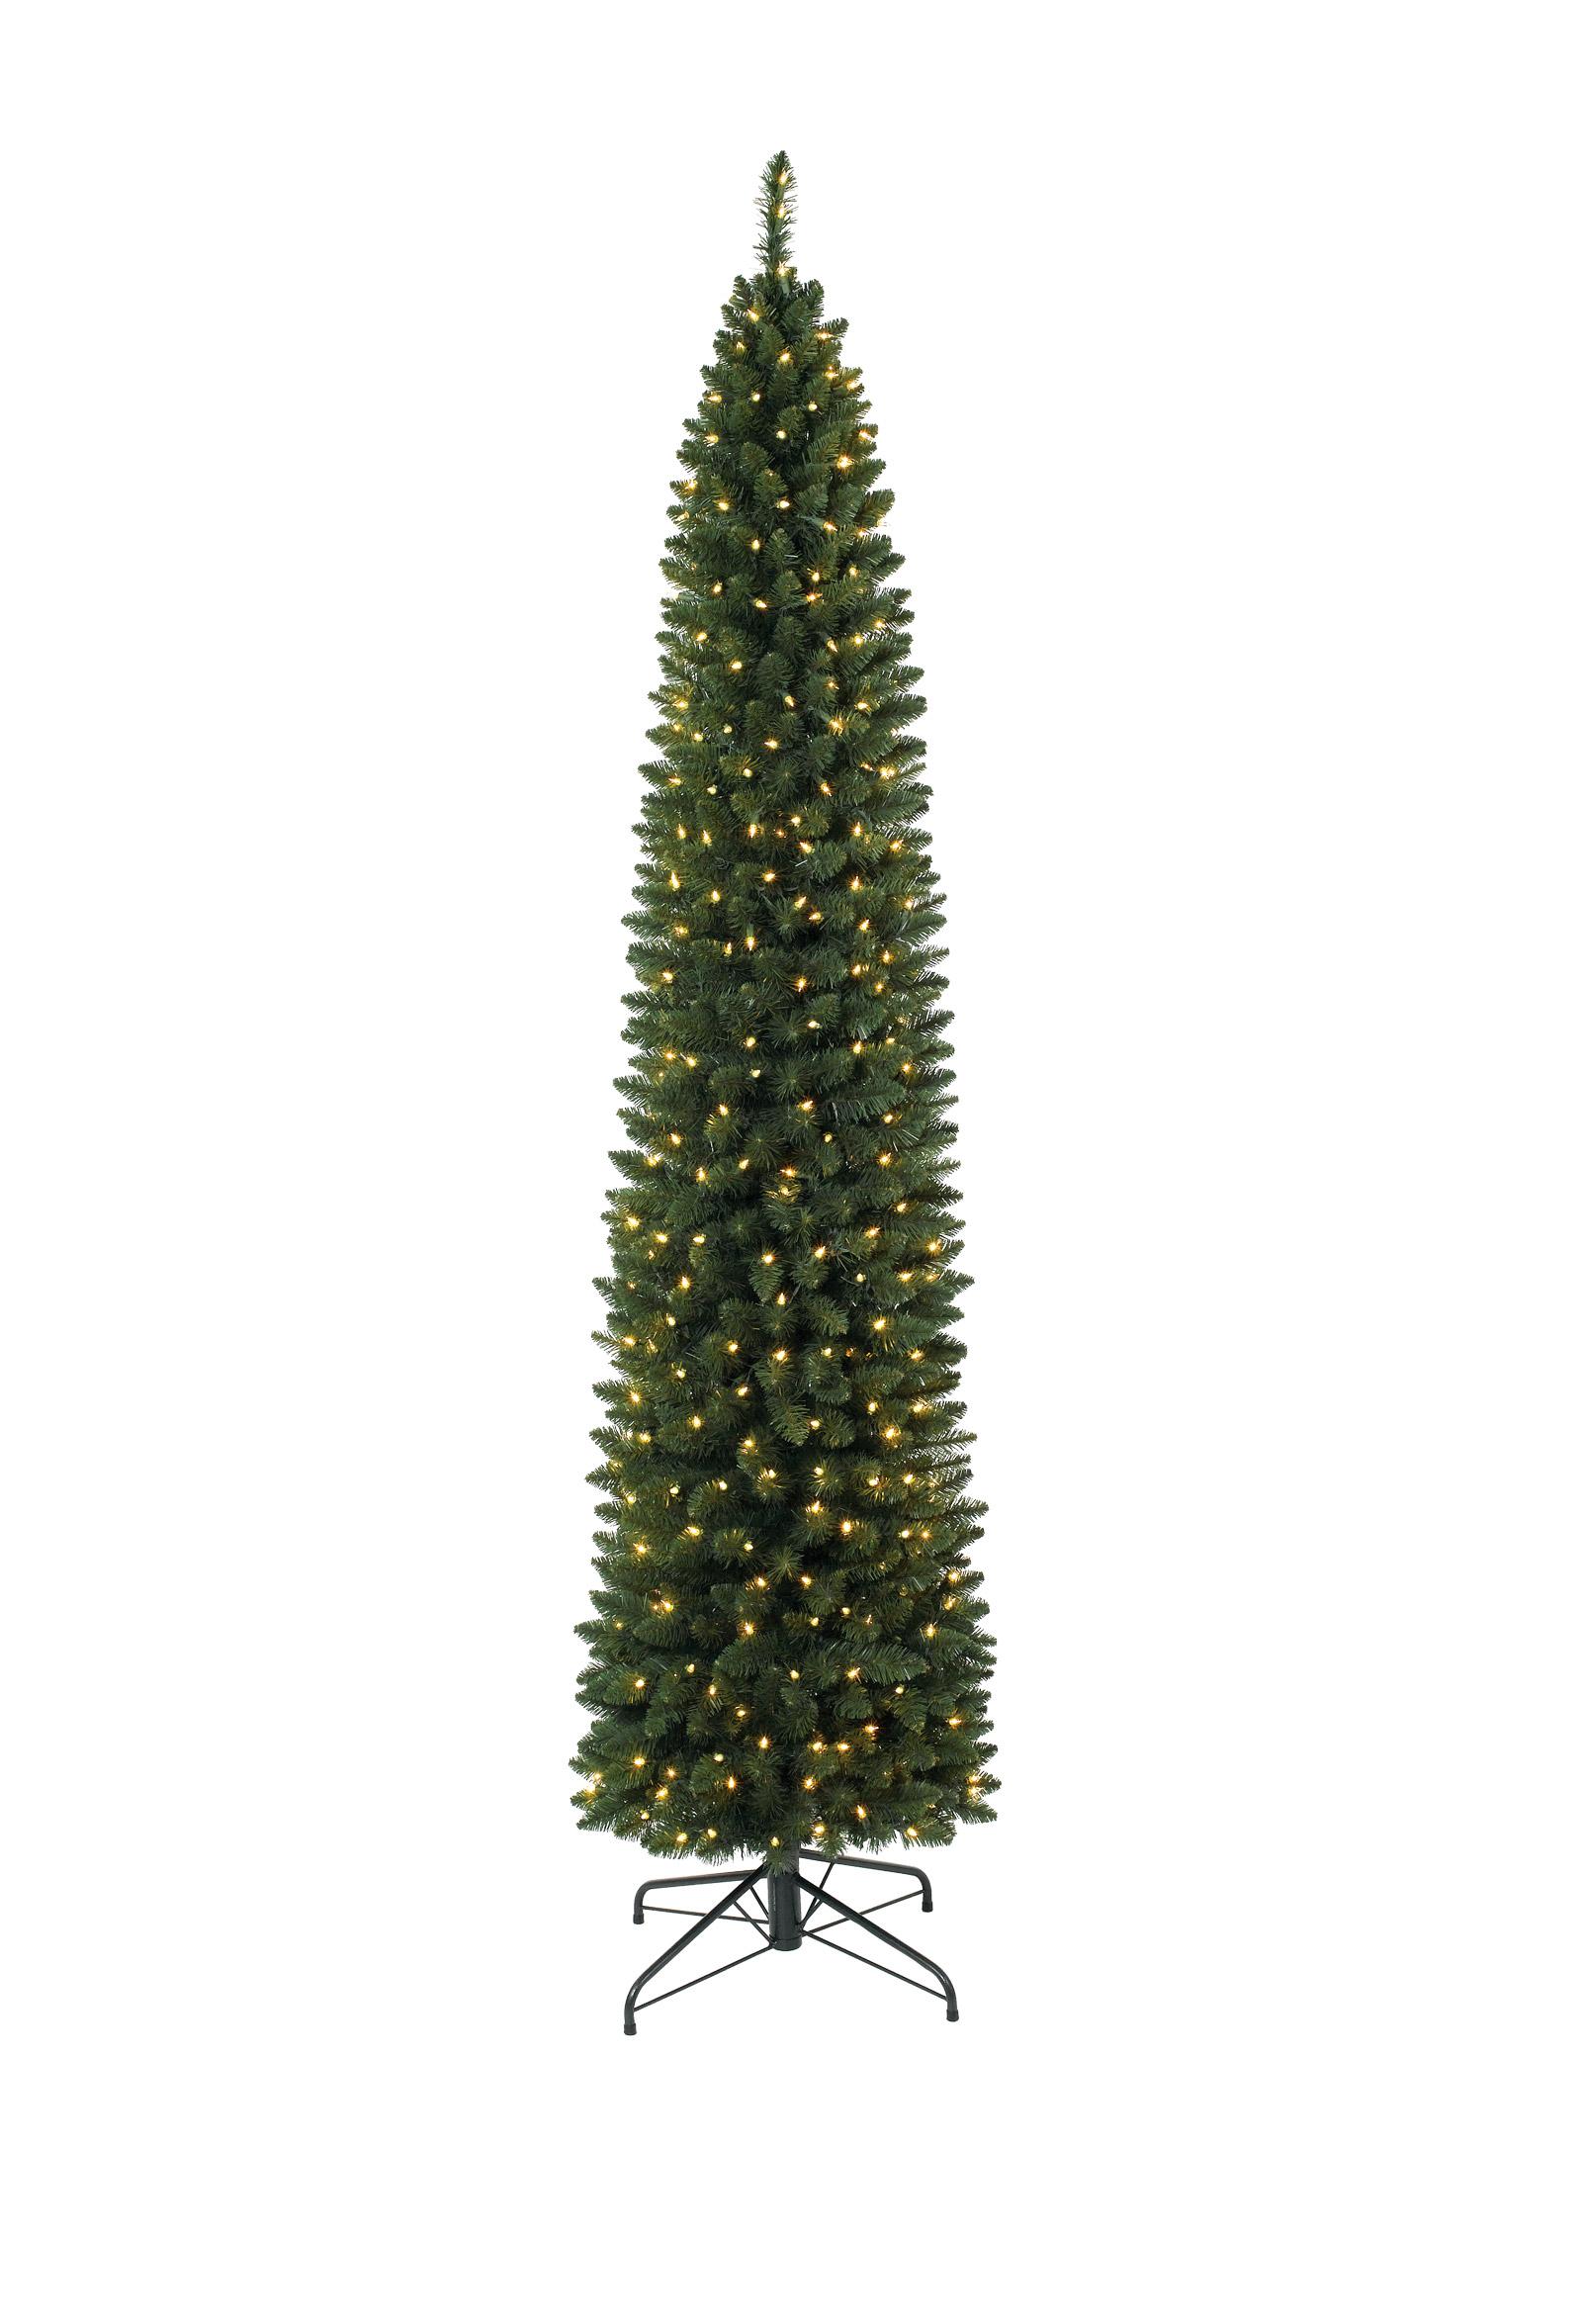 9 Ft Pre Lit Ticonderoga Pencil Christmas Tree Christmas